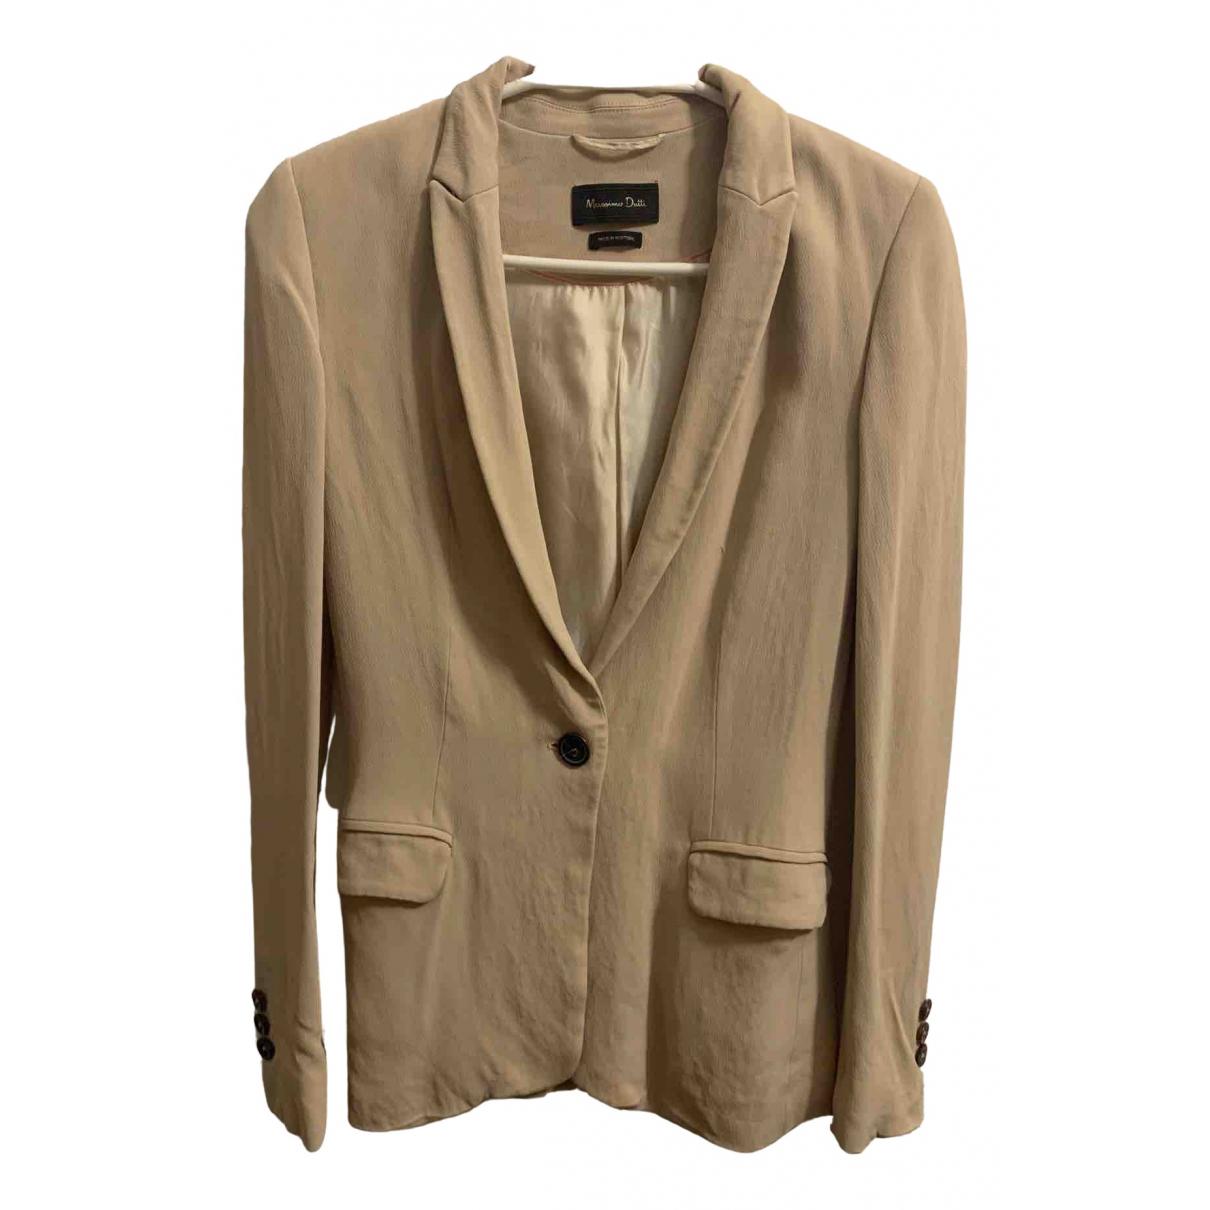 Massimo Dutti \N Ecru jacket for Women XS International